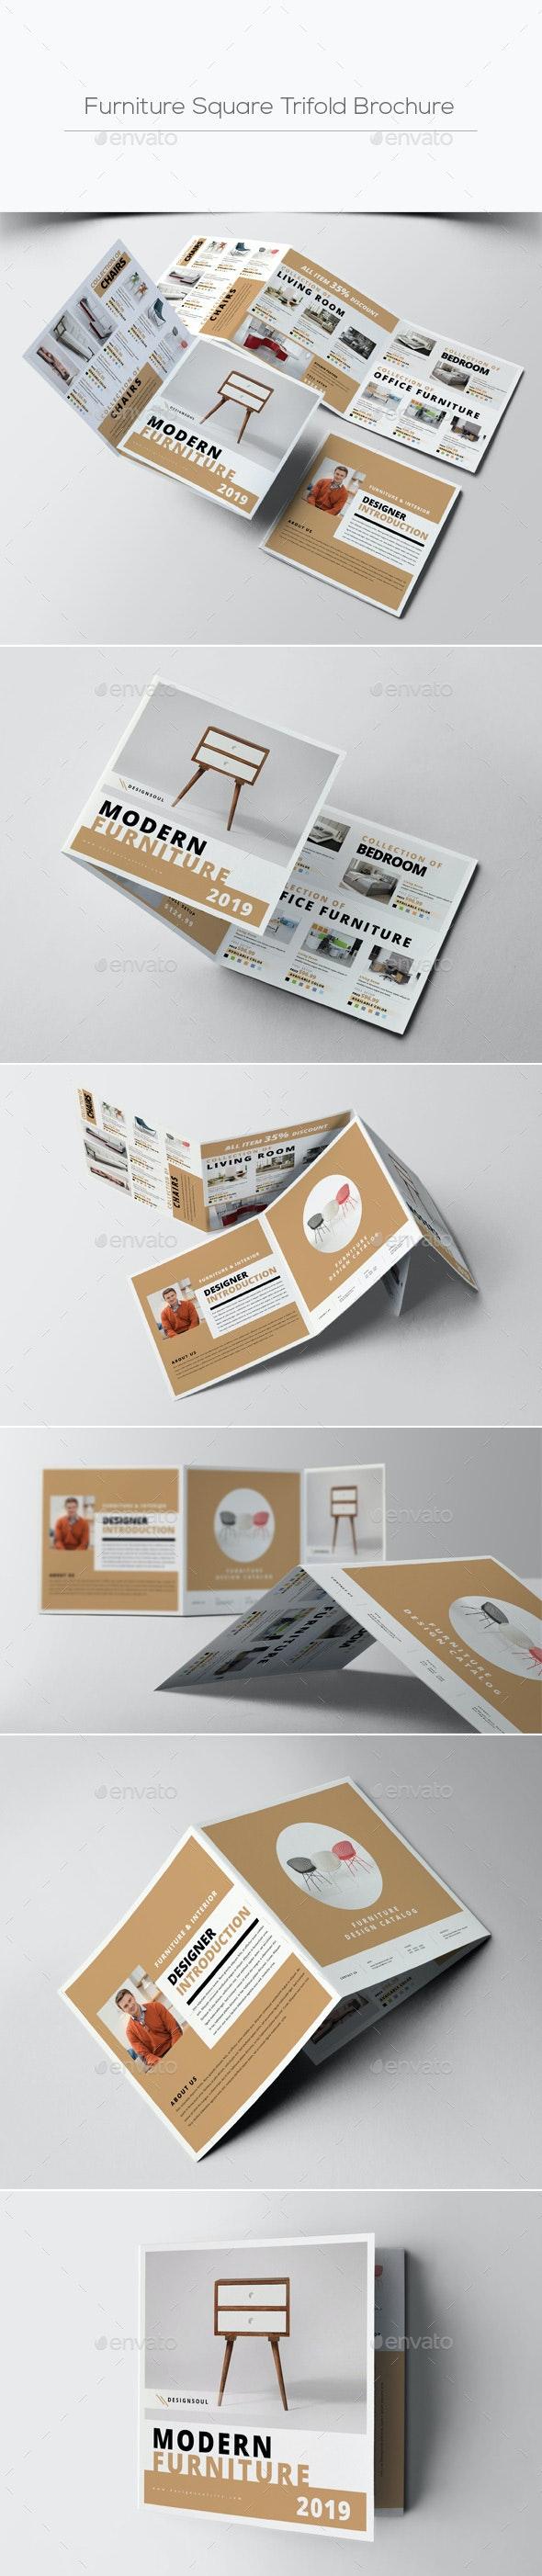 Furniture Square Trifold Brochure - Catalogs Brochures